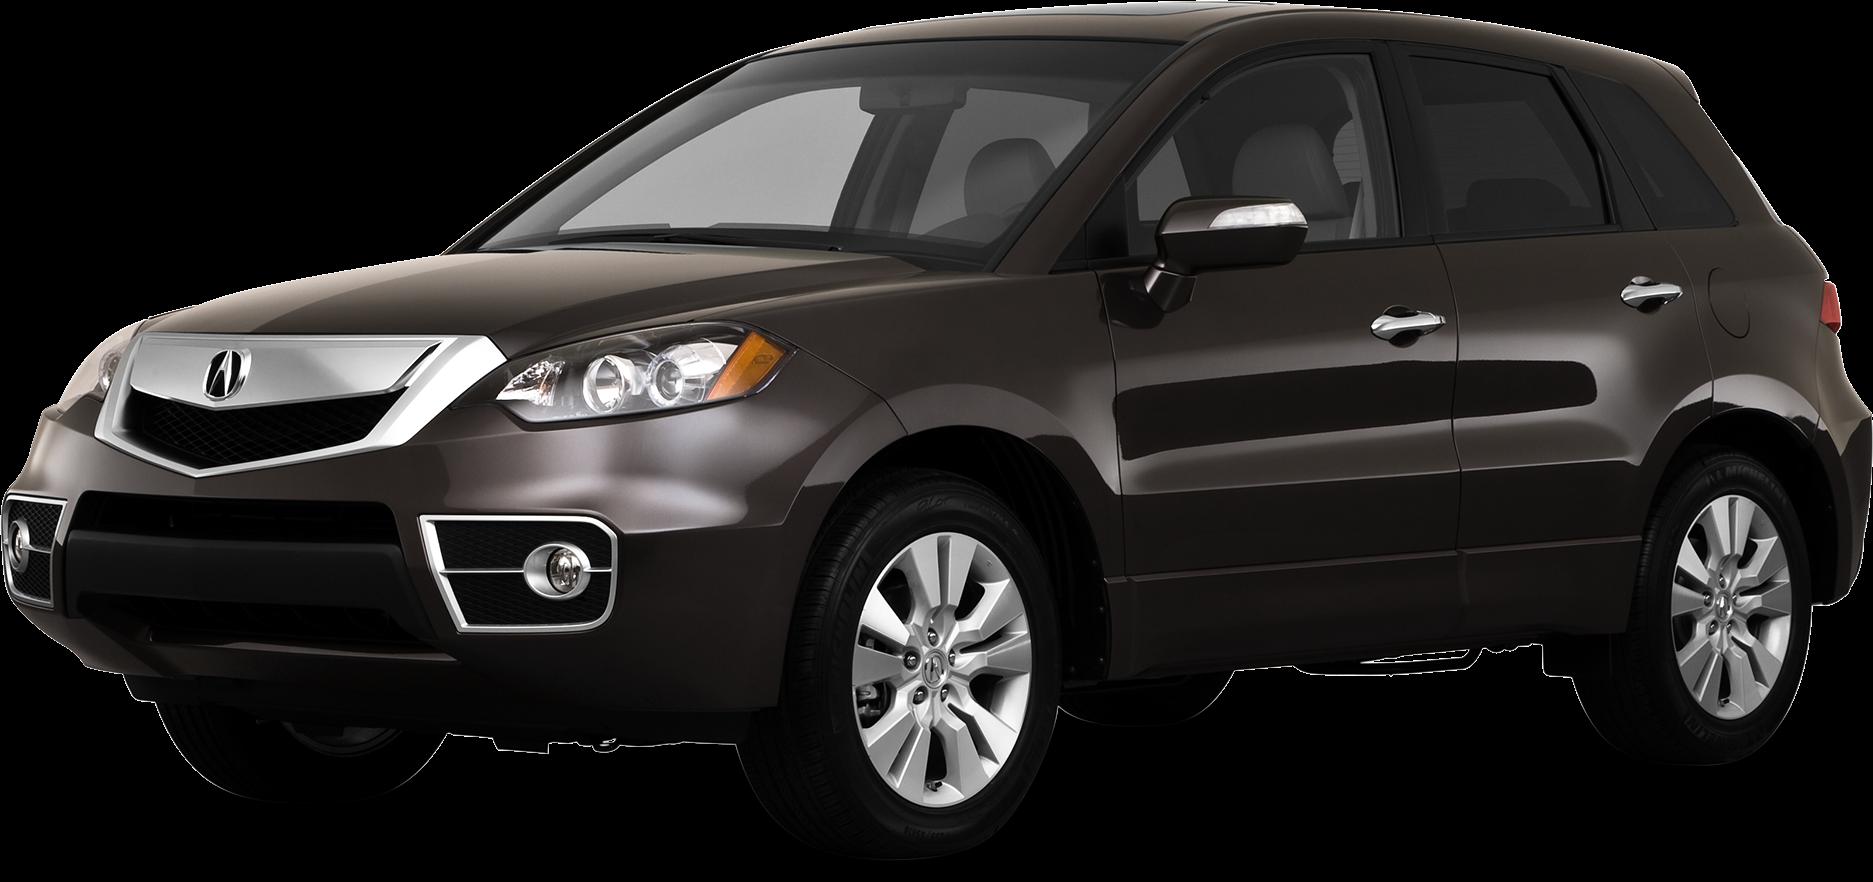 2010 Acura Rdx Values Cars For Sale Kelley Blue Book